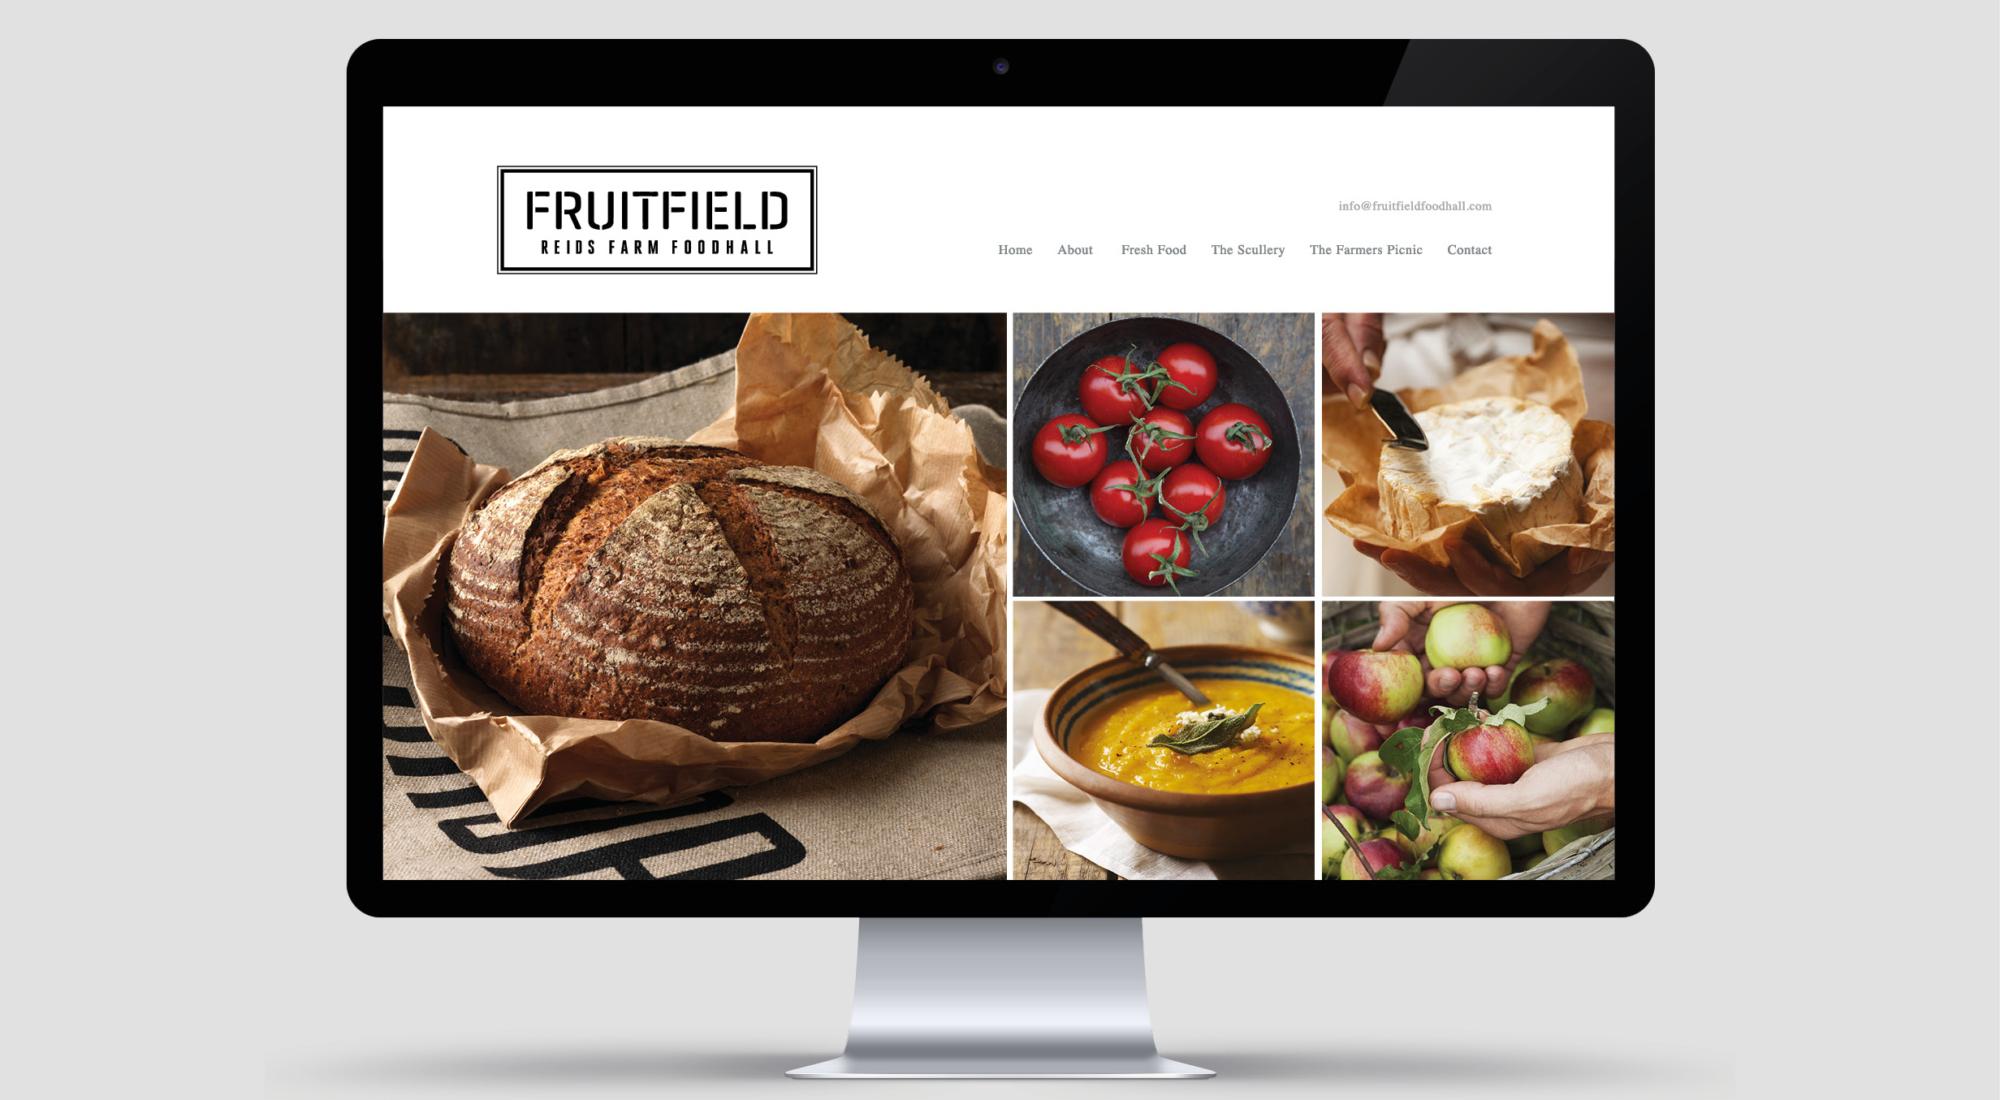 https://alanjacksondesign.co.uk/wp-content/uploads/2021/09/fruitfield-foodhall-img3.jpg